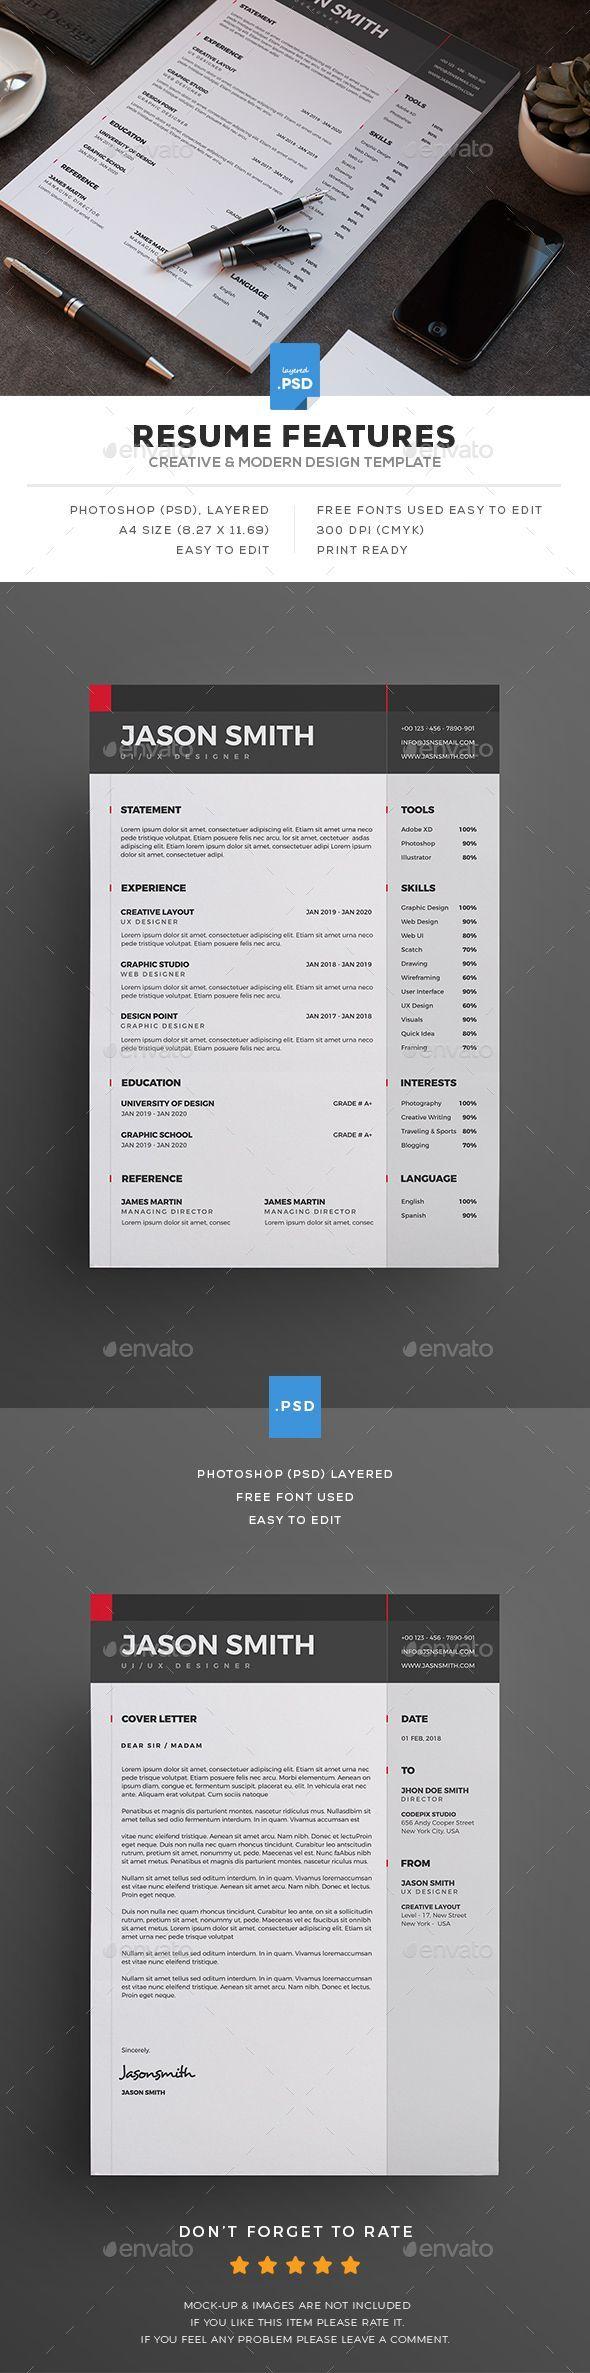 Resume u2014 Photoshop PSD cv template presentation